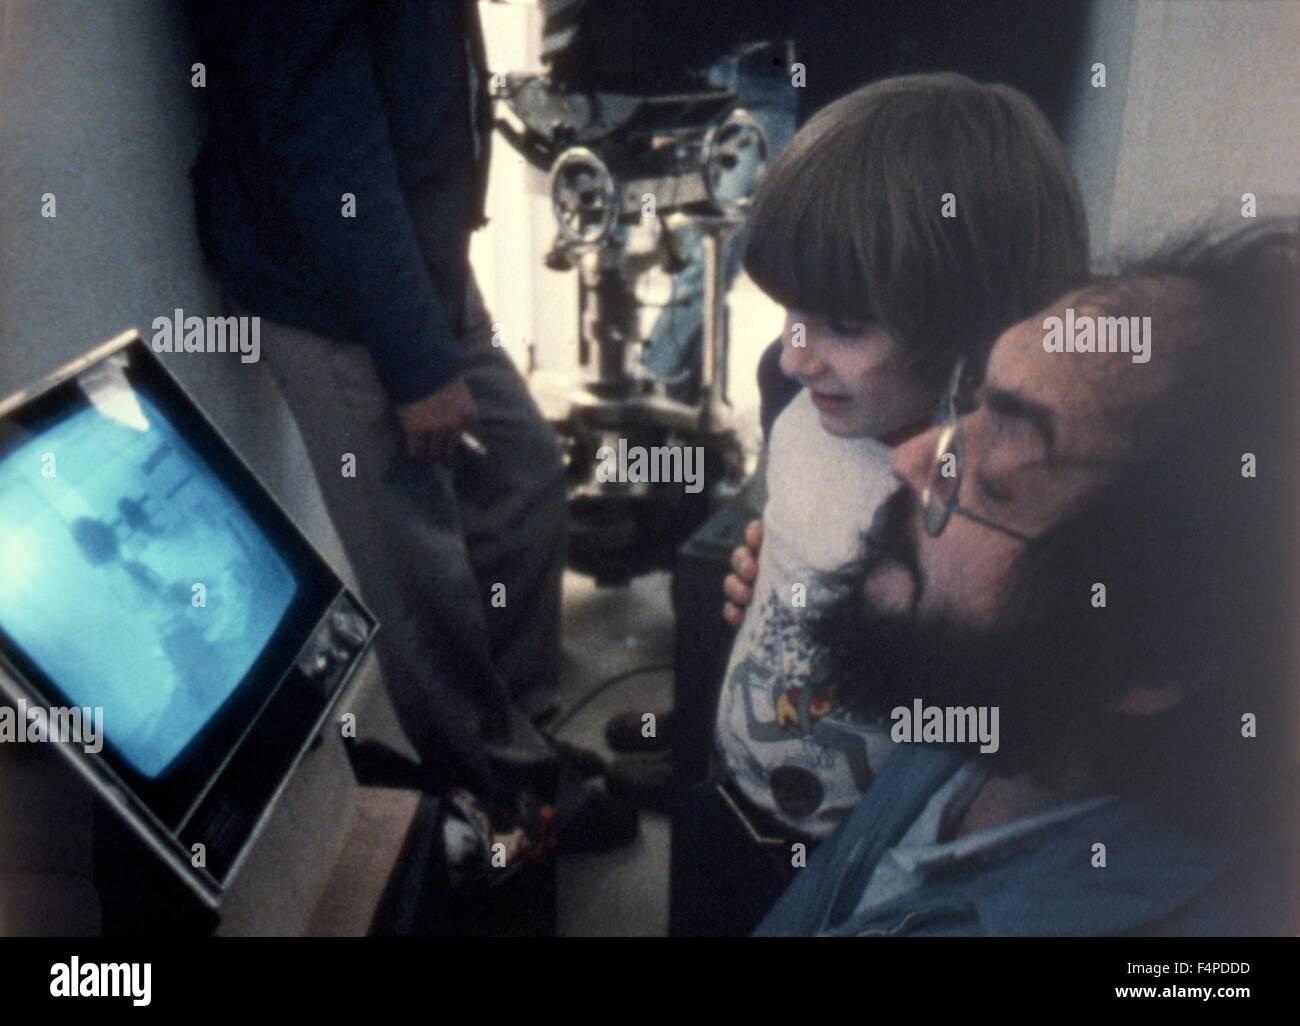 Stanley Kubrick / Shining 1980 directed by Stanley Kubrick - Stock Image